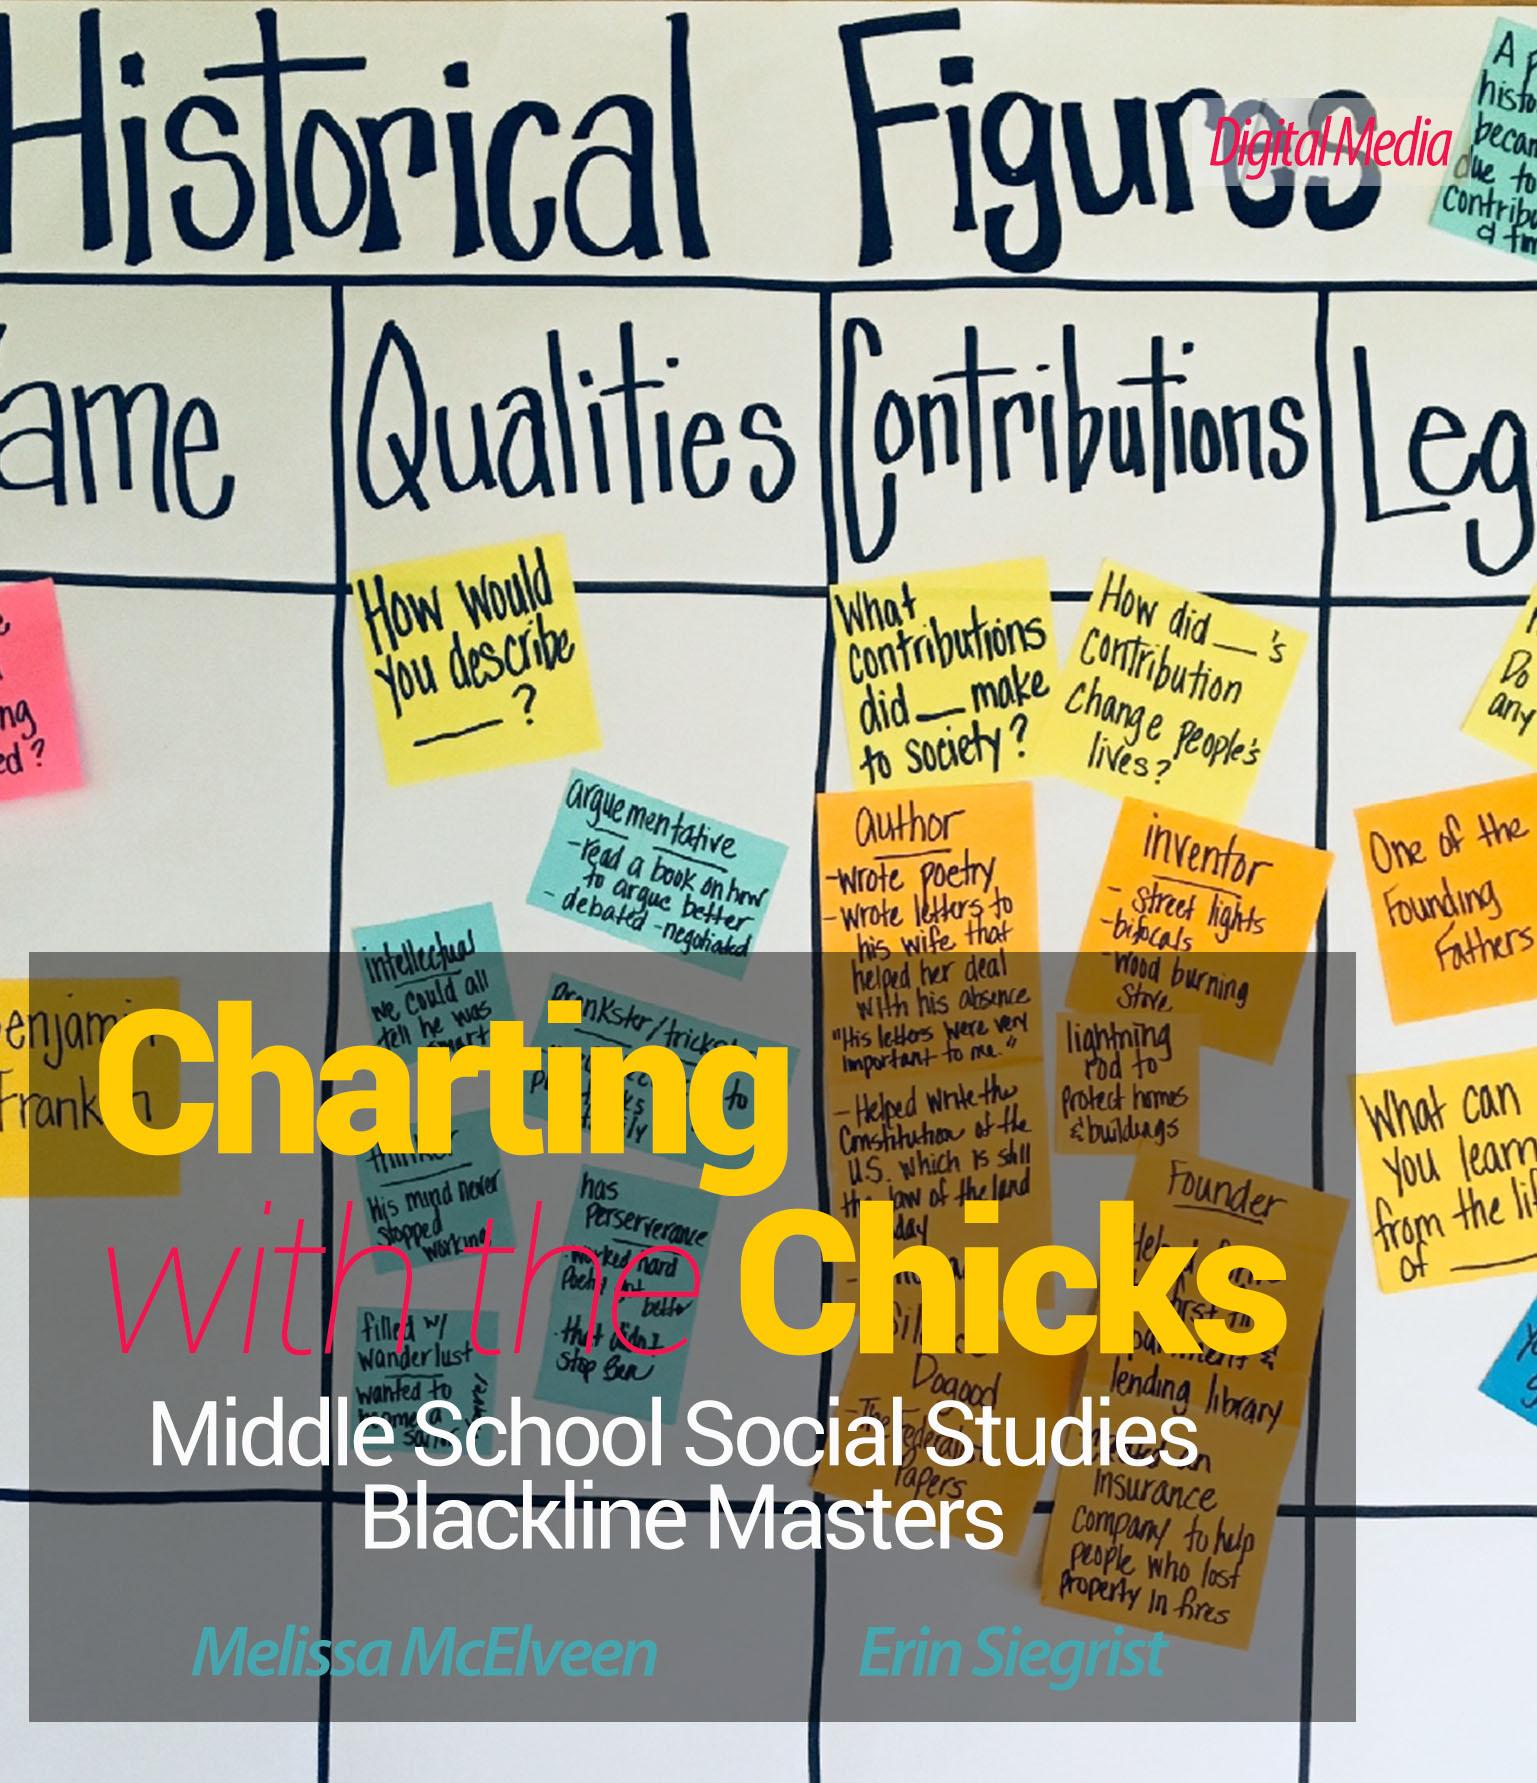 Social Stu S Blackline Masters Chart Chicks